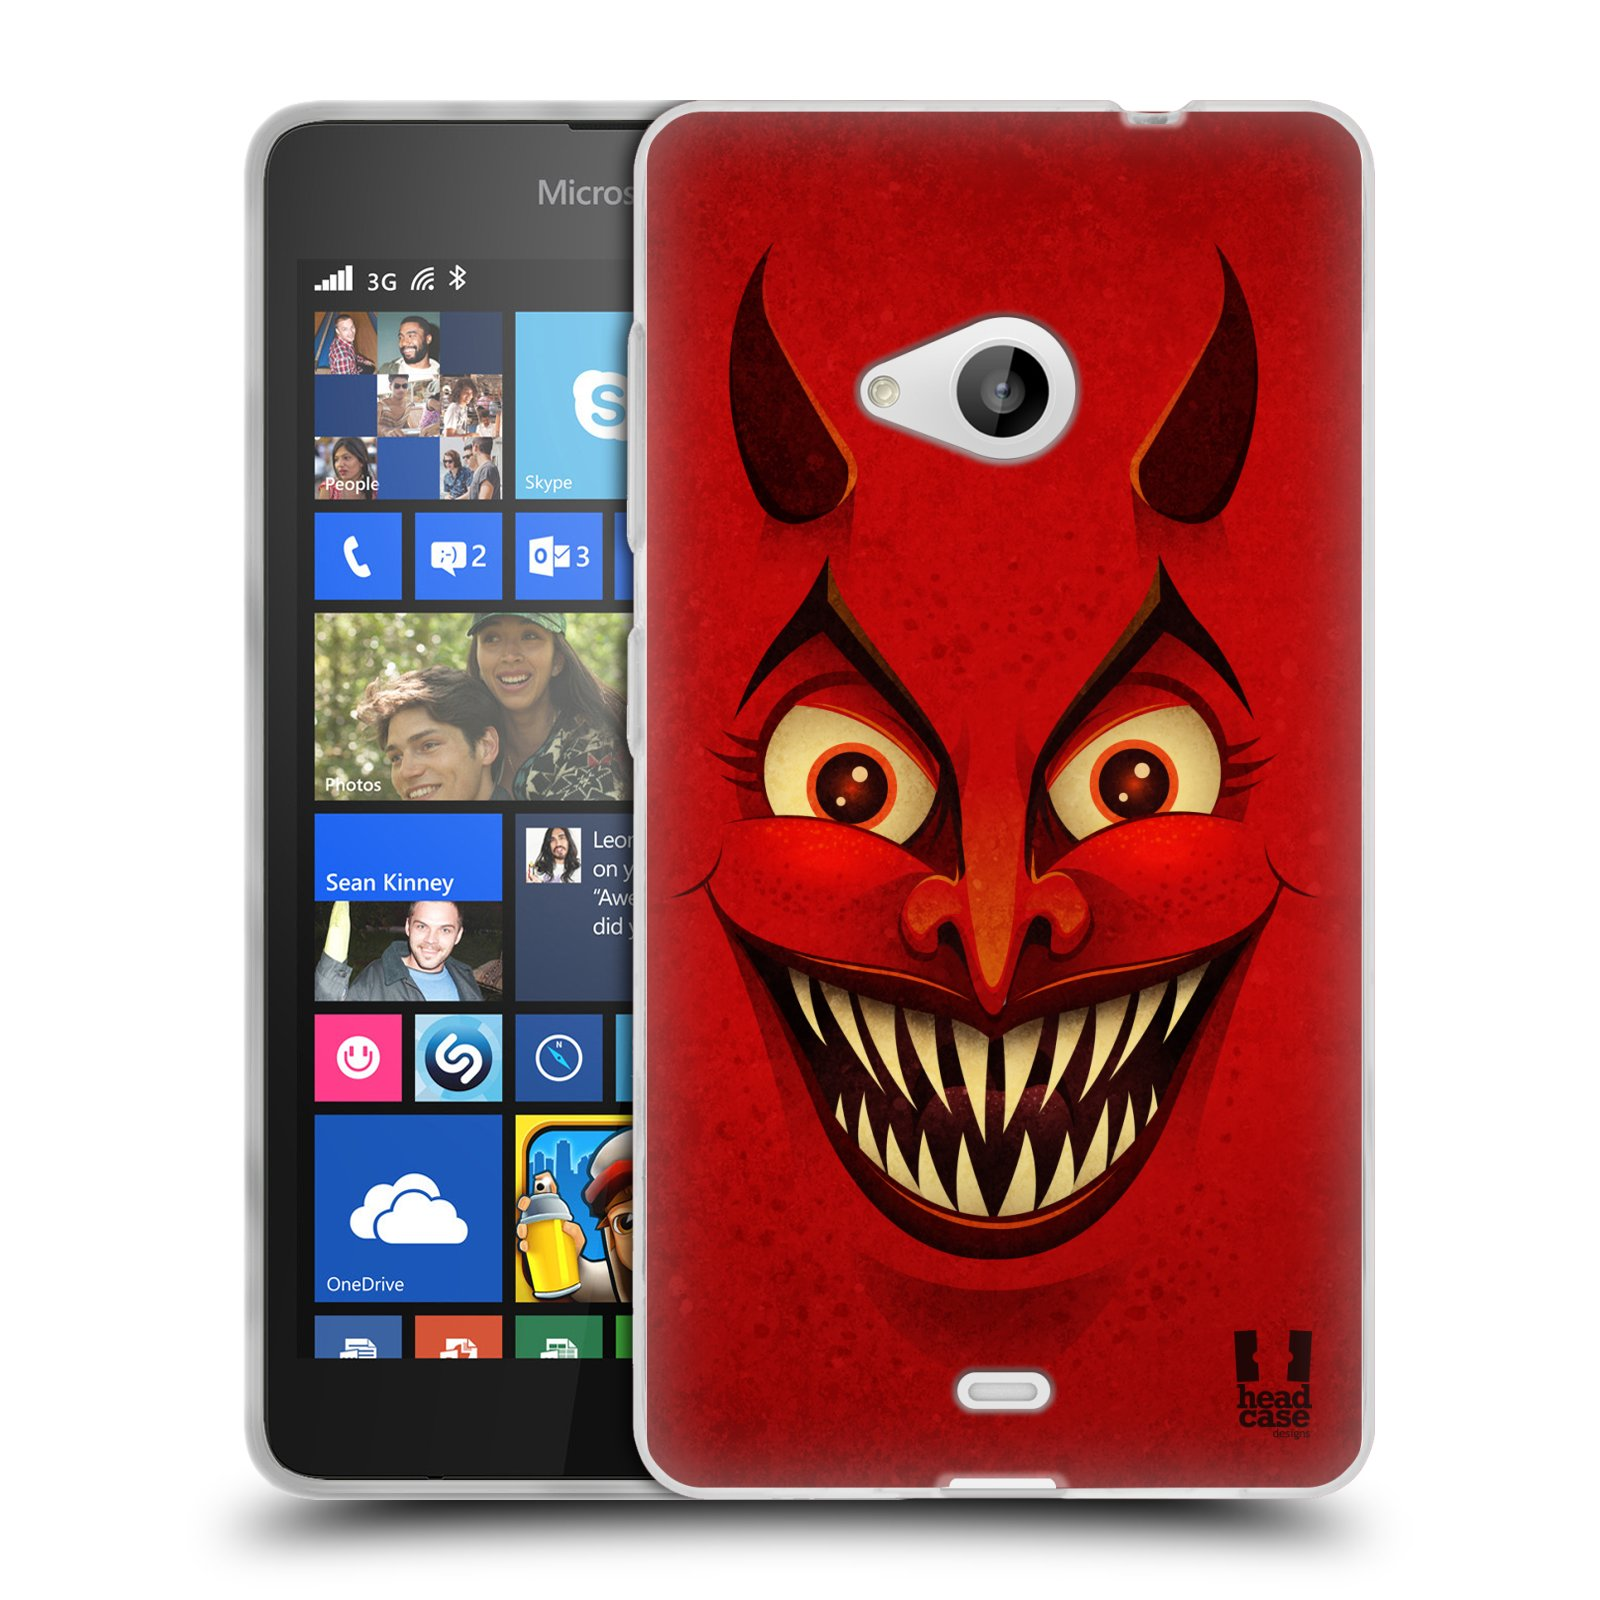 Silikonové pouzdro na mobil Microsoft Lumia 535 HEAD CASE ČERT (Silikonový kryt či obal na mobilní telefon Microsoft Lumia 535)